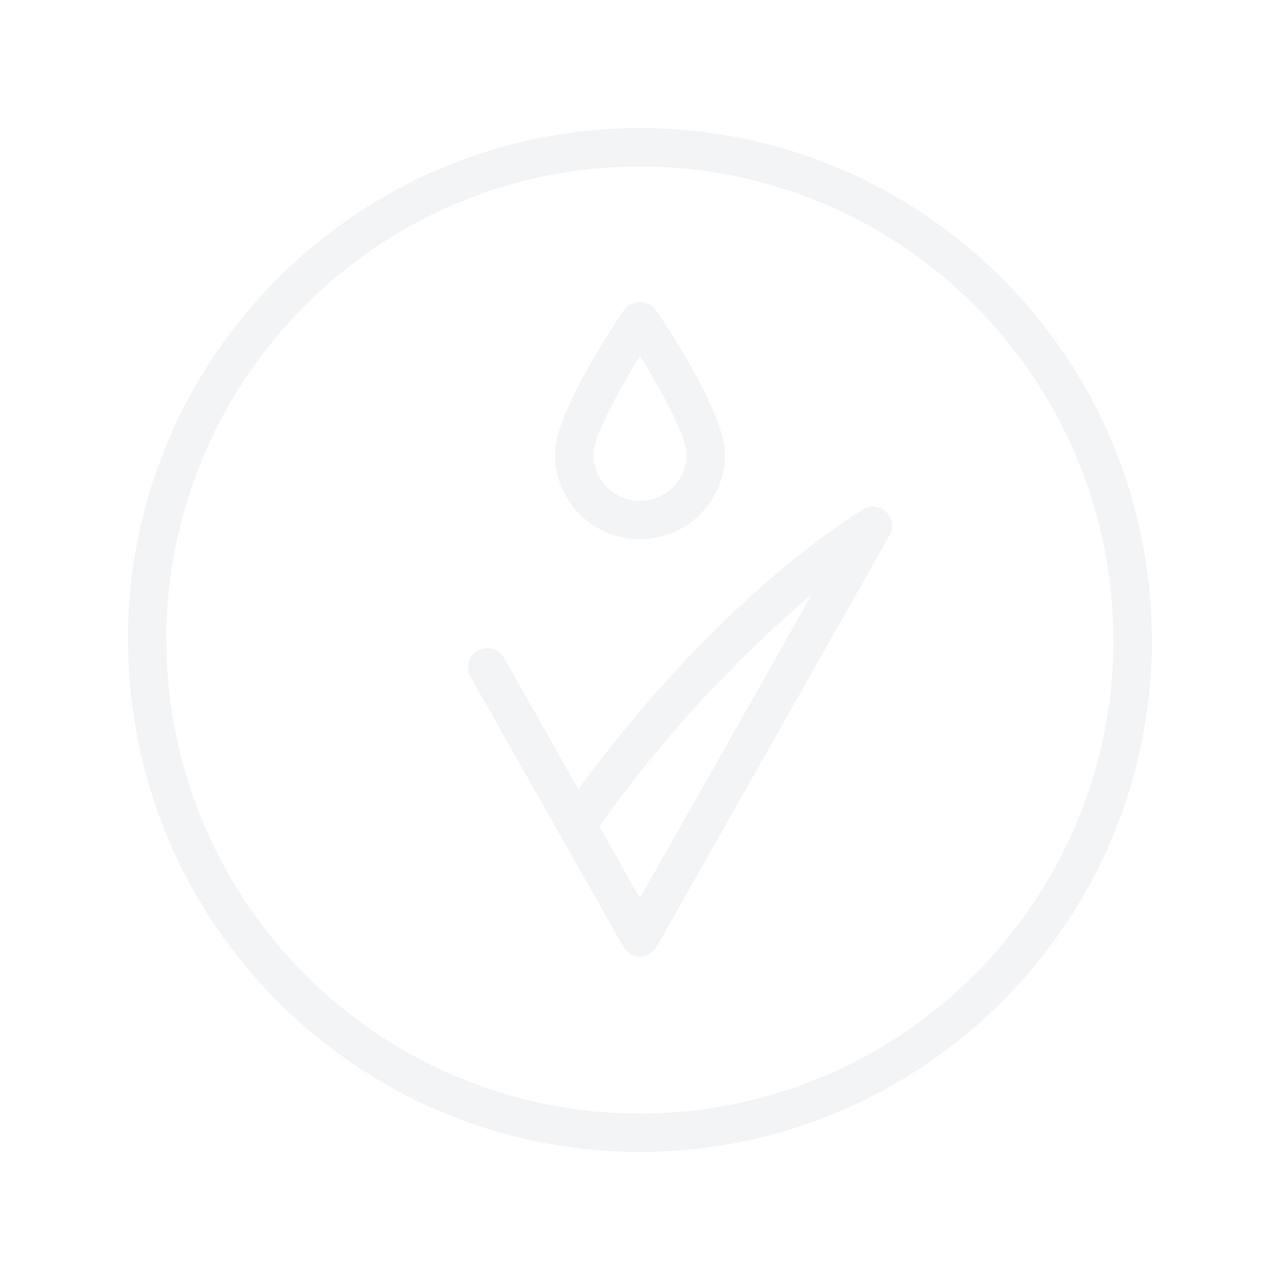 MARLIES MÖLLER Pashmisilk Luxury Silky Cream Mask 125ml